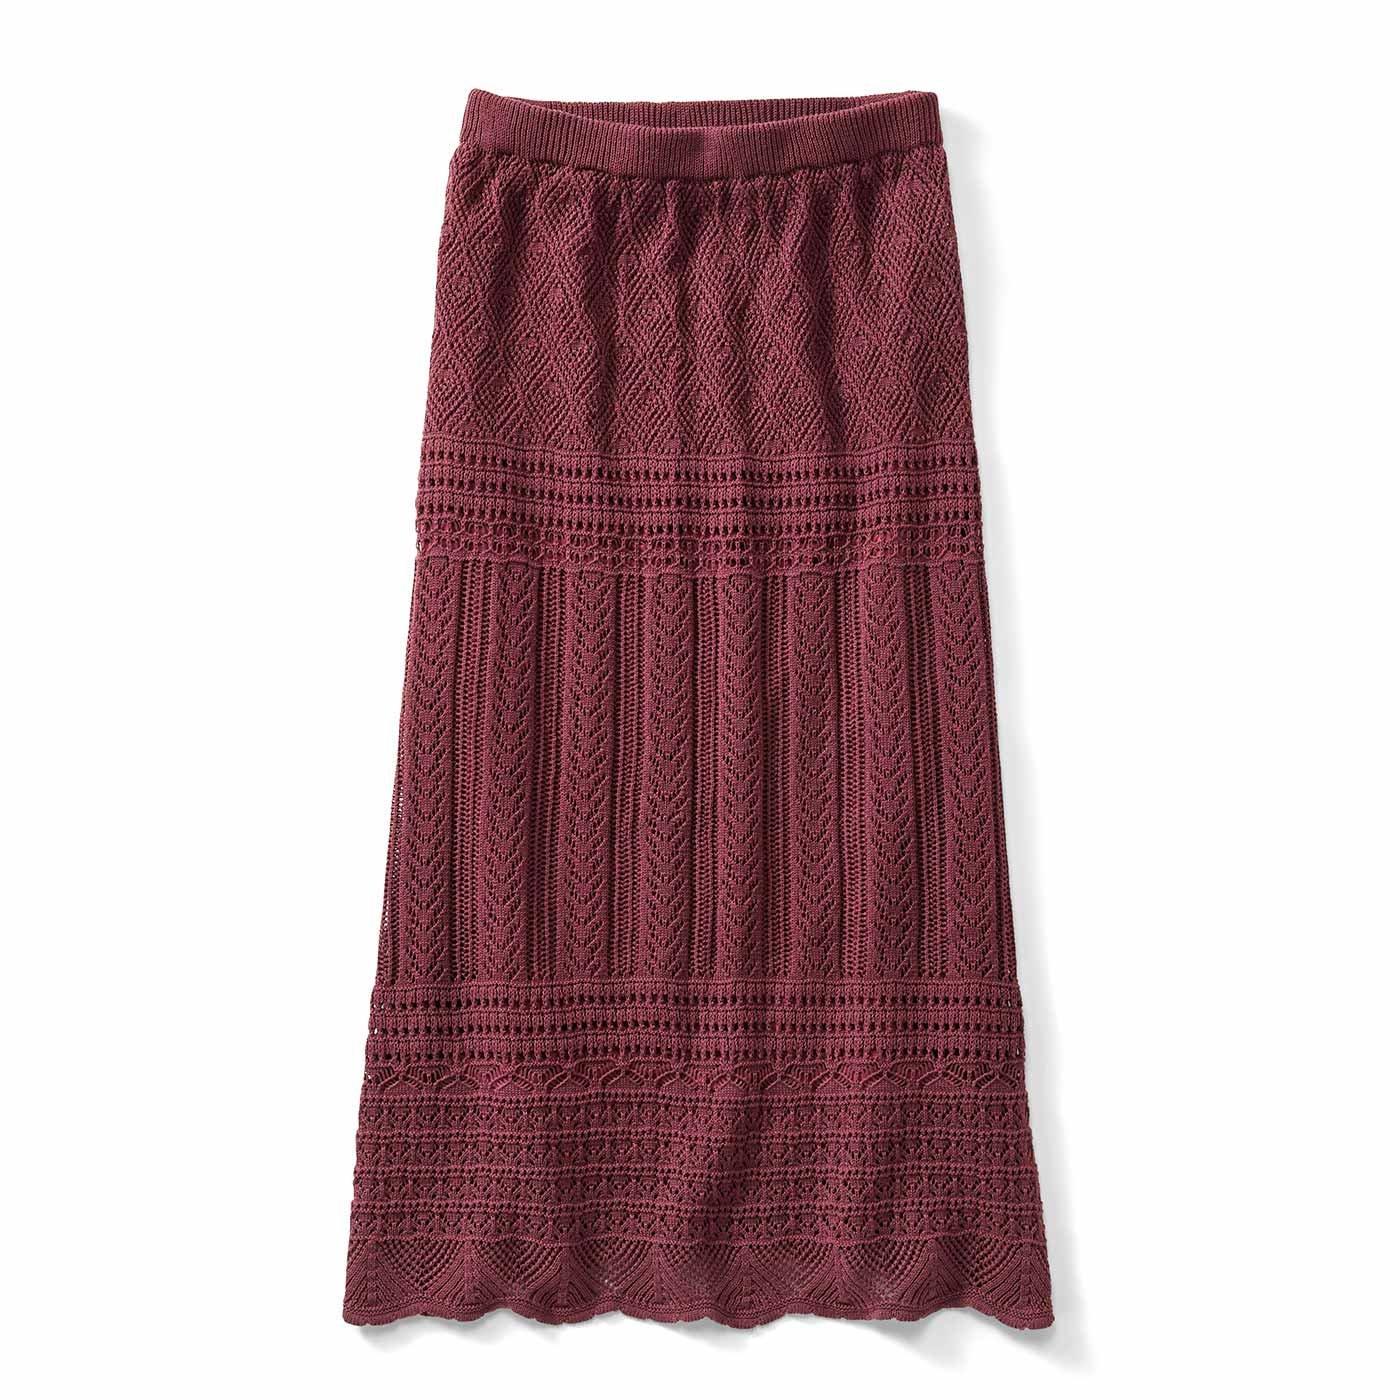 IEDIT[イディット] クロシェ編み風ロングニットスカート〈テラコッタブラウン〉